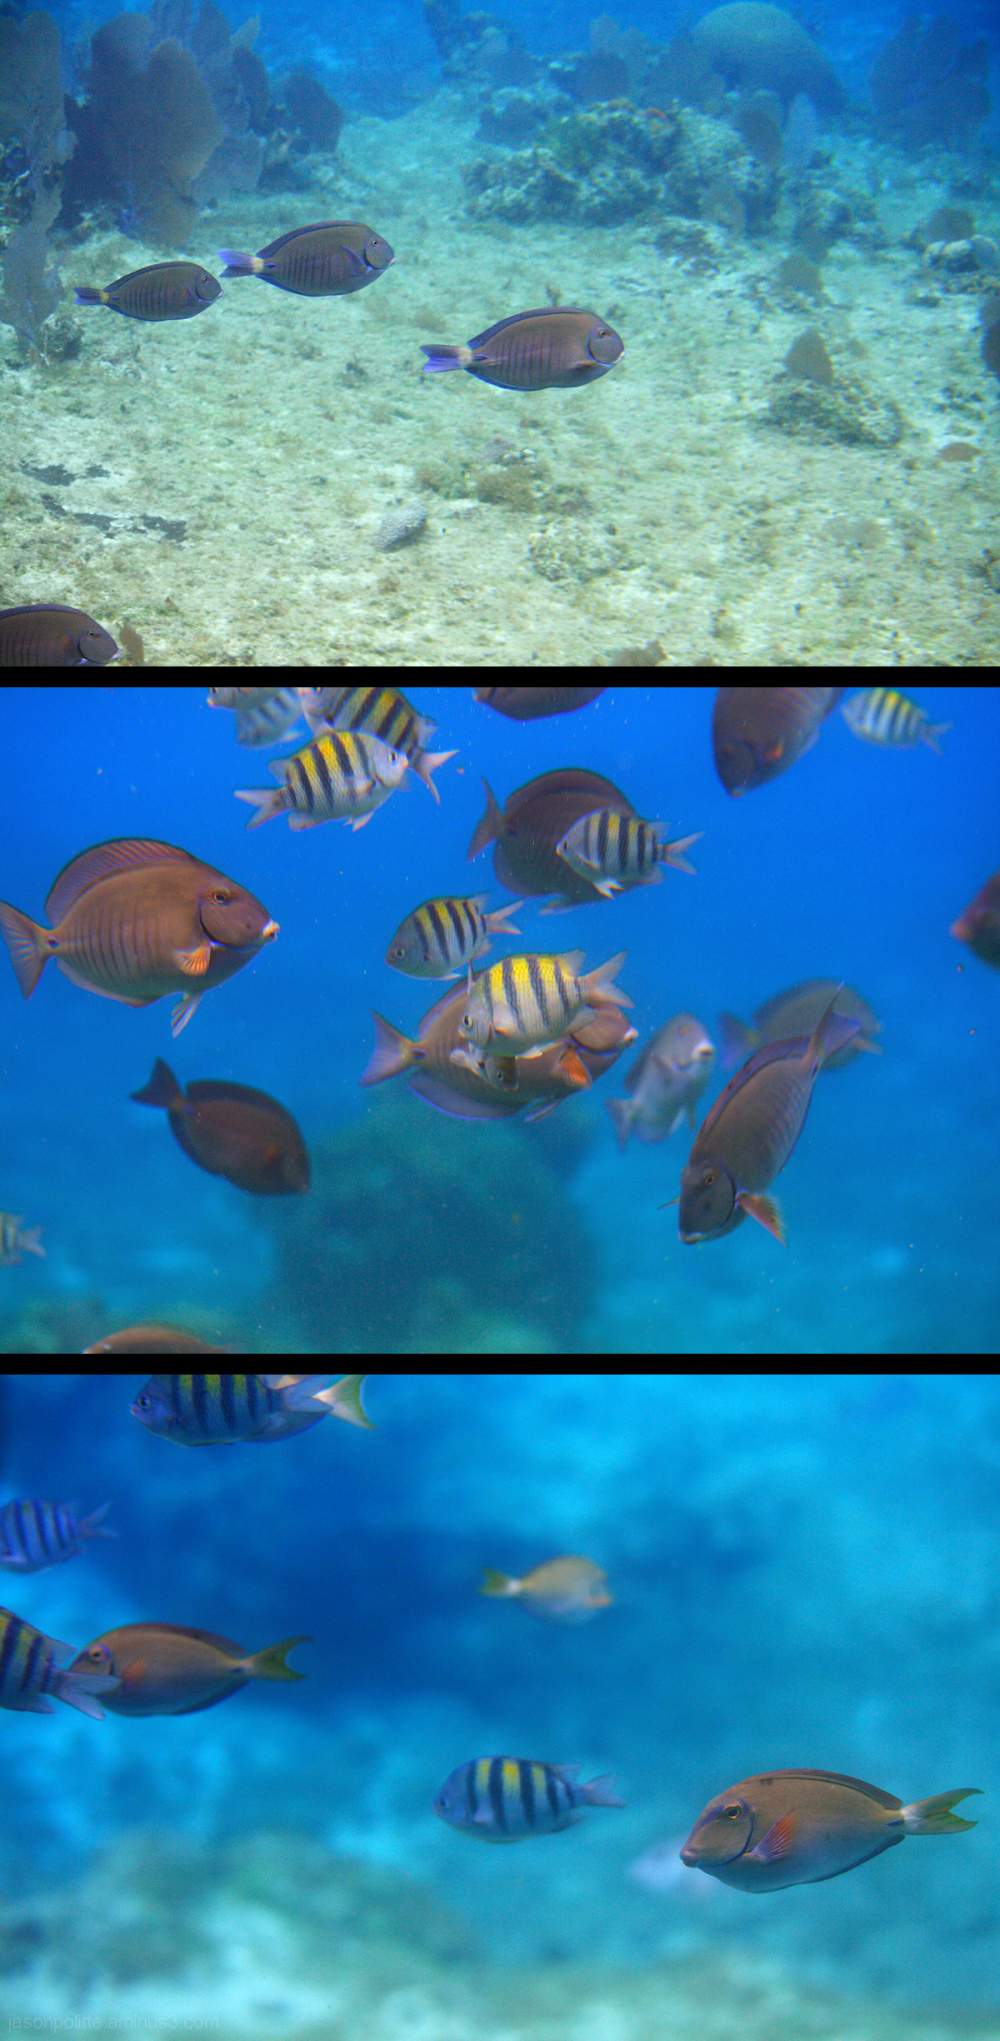 Sergeant Majors and Ocean Sunfish at Paradise Reef